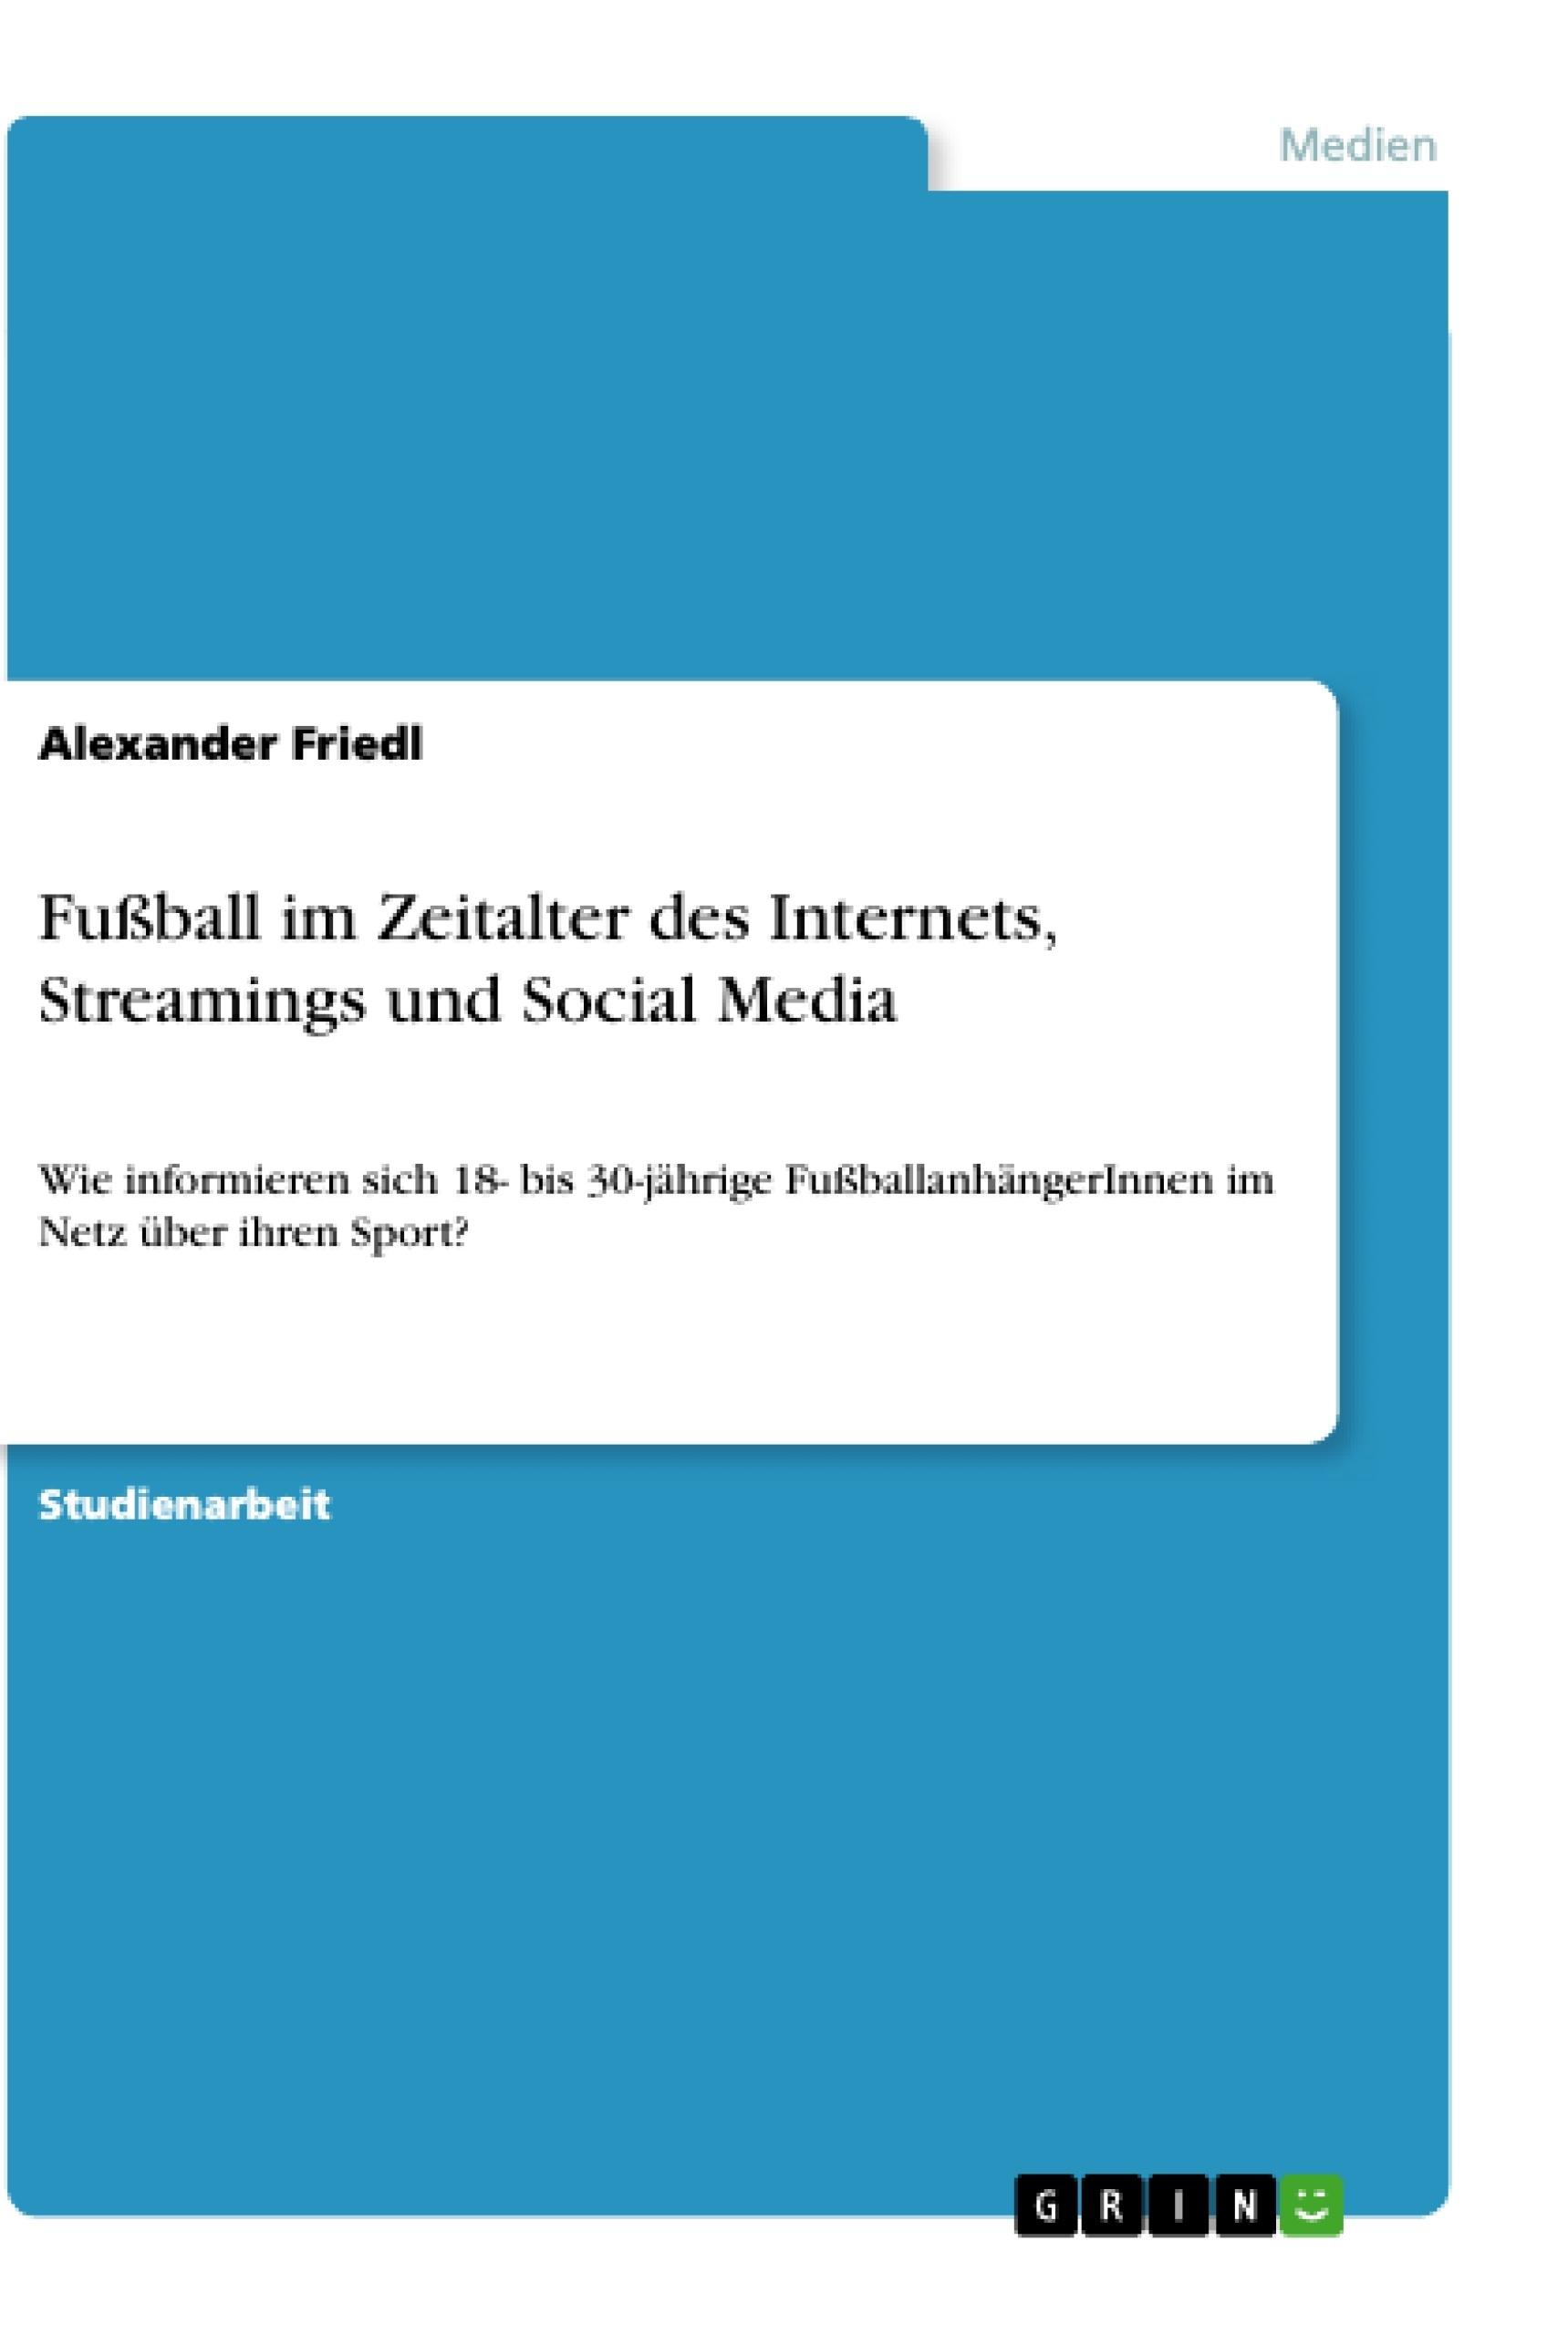 Titel: Fußball im Zeitalter des Internets, Streamings und Social Media